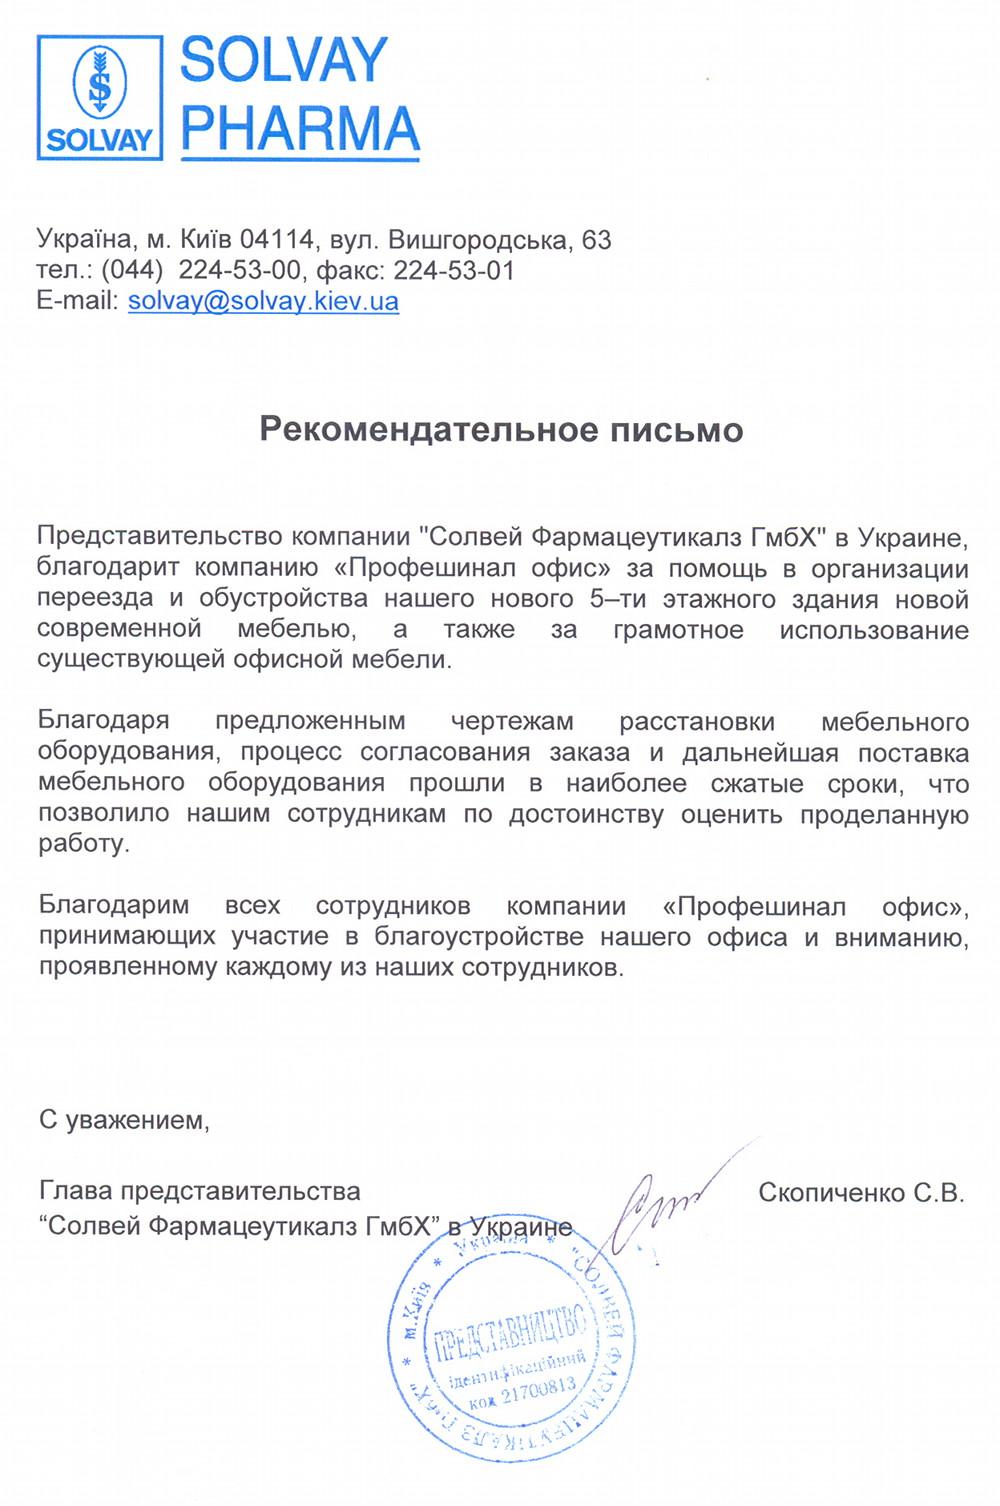 Профешинал Oфис, ООО